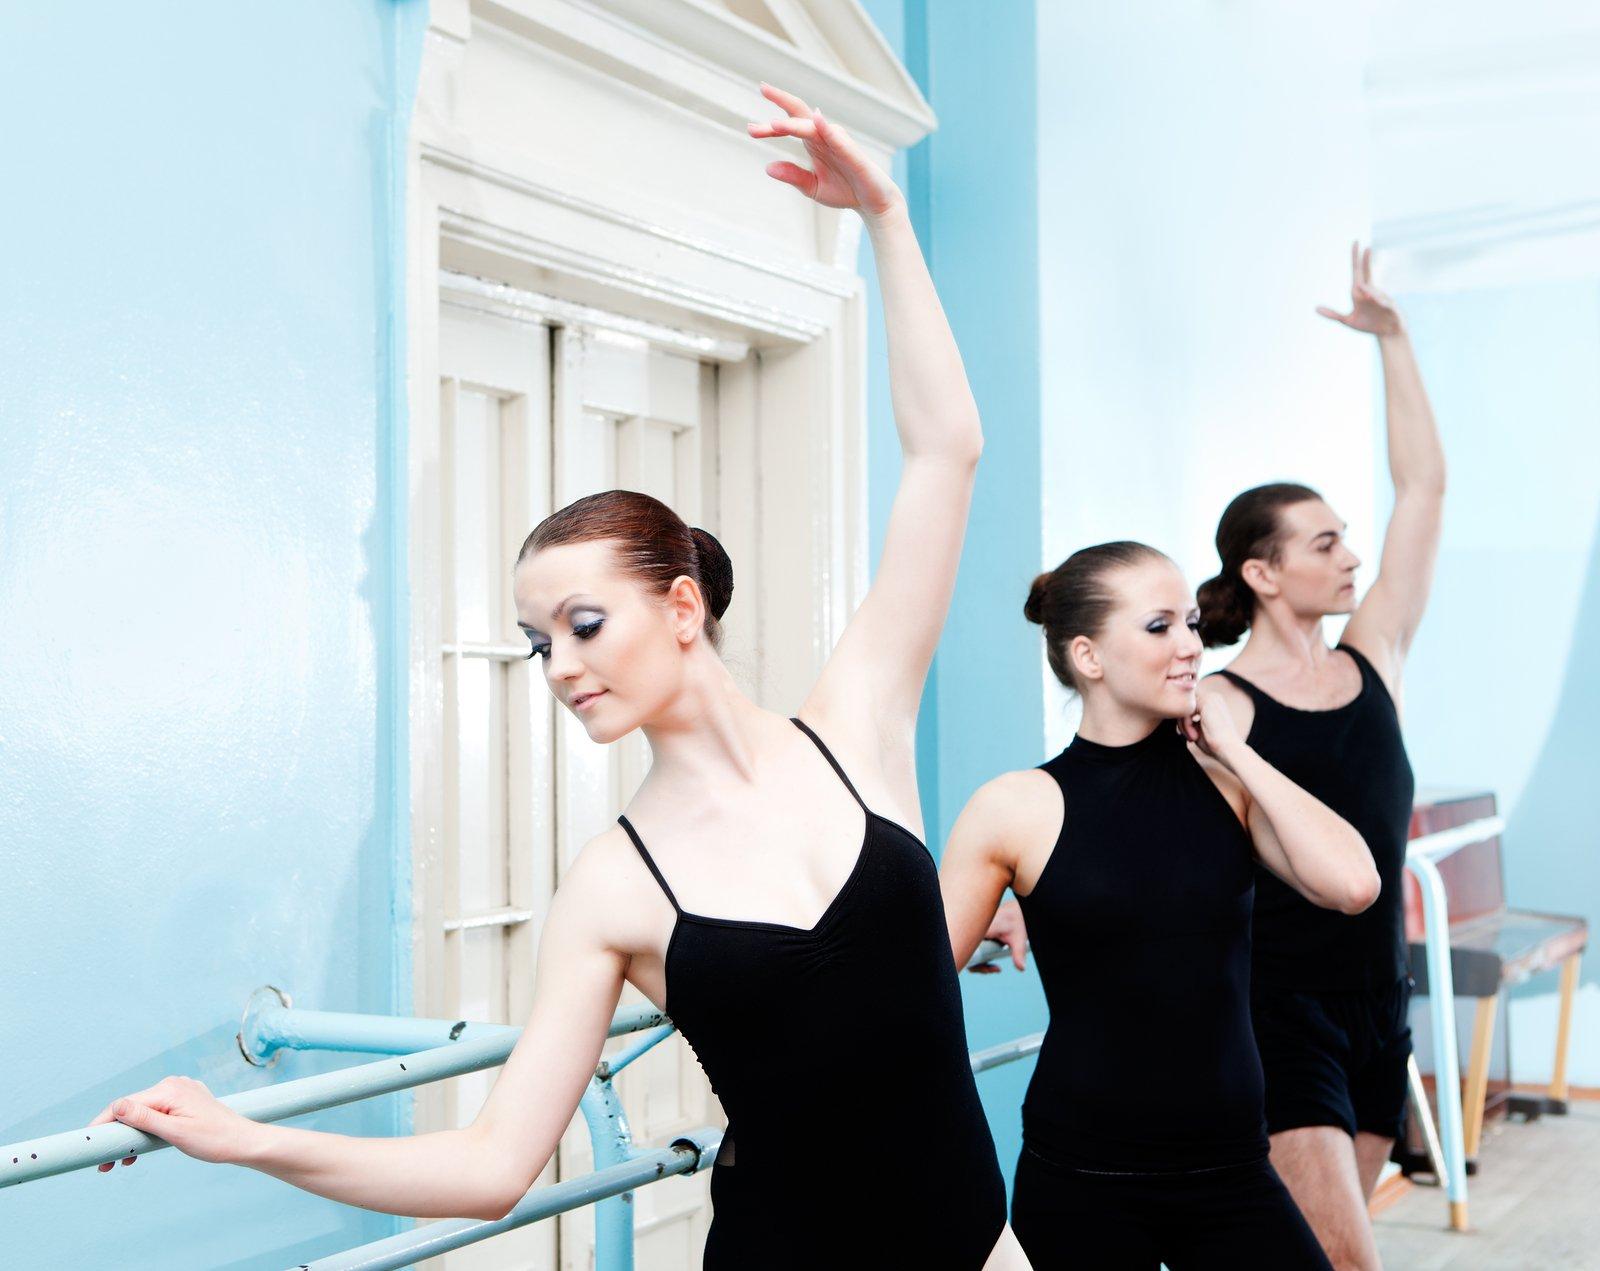 adult ballet dancers in studio rehearsal